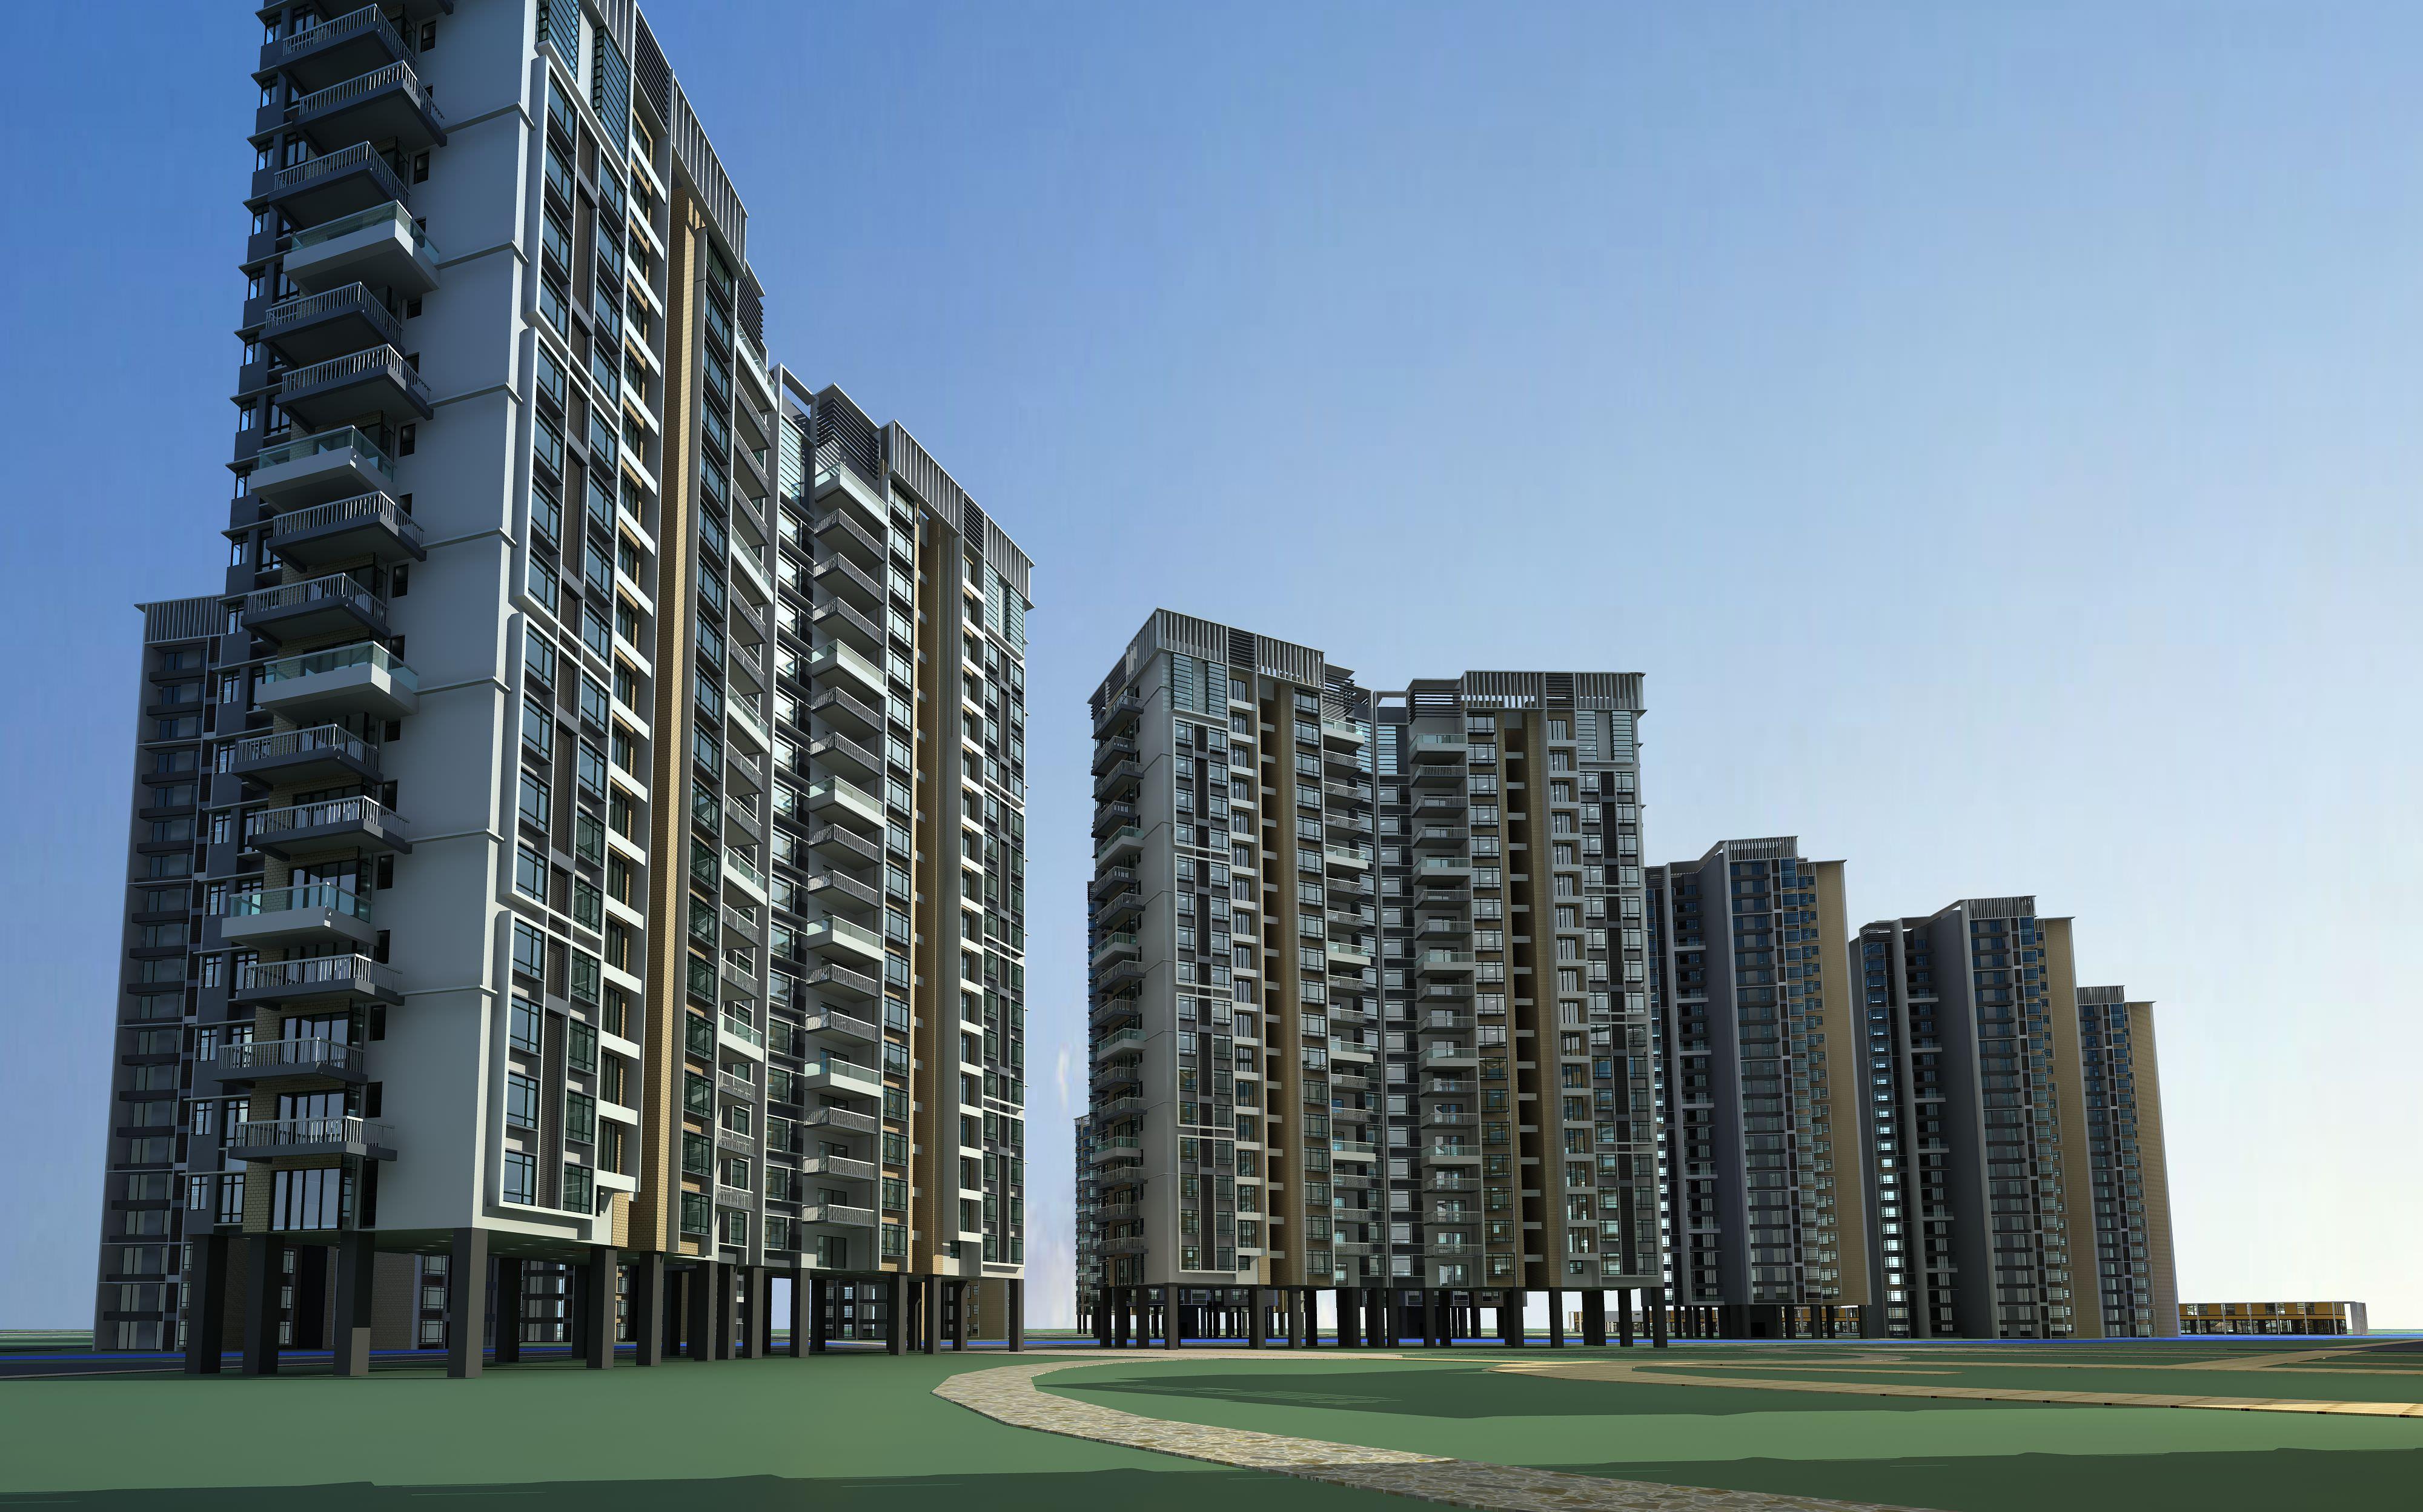 Multi Storey Apartment Buildings 3d Model Max 3ds 1 ...